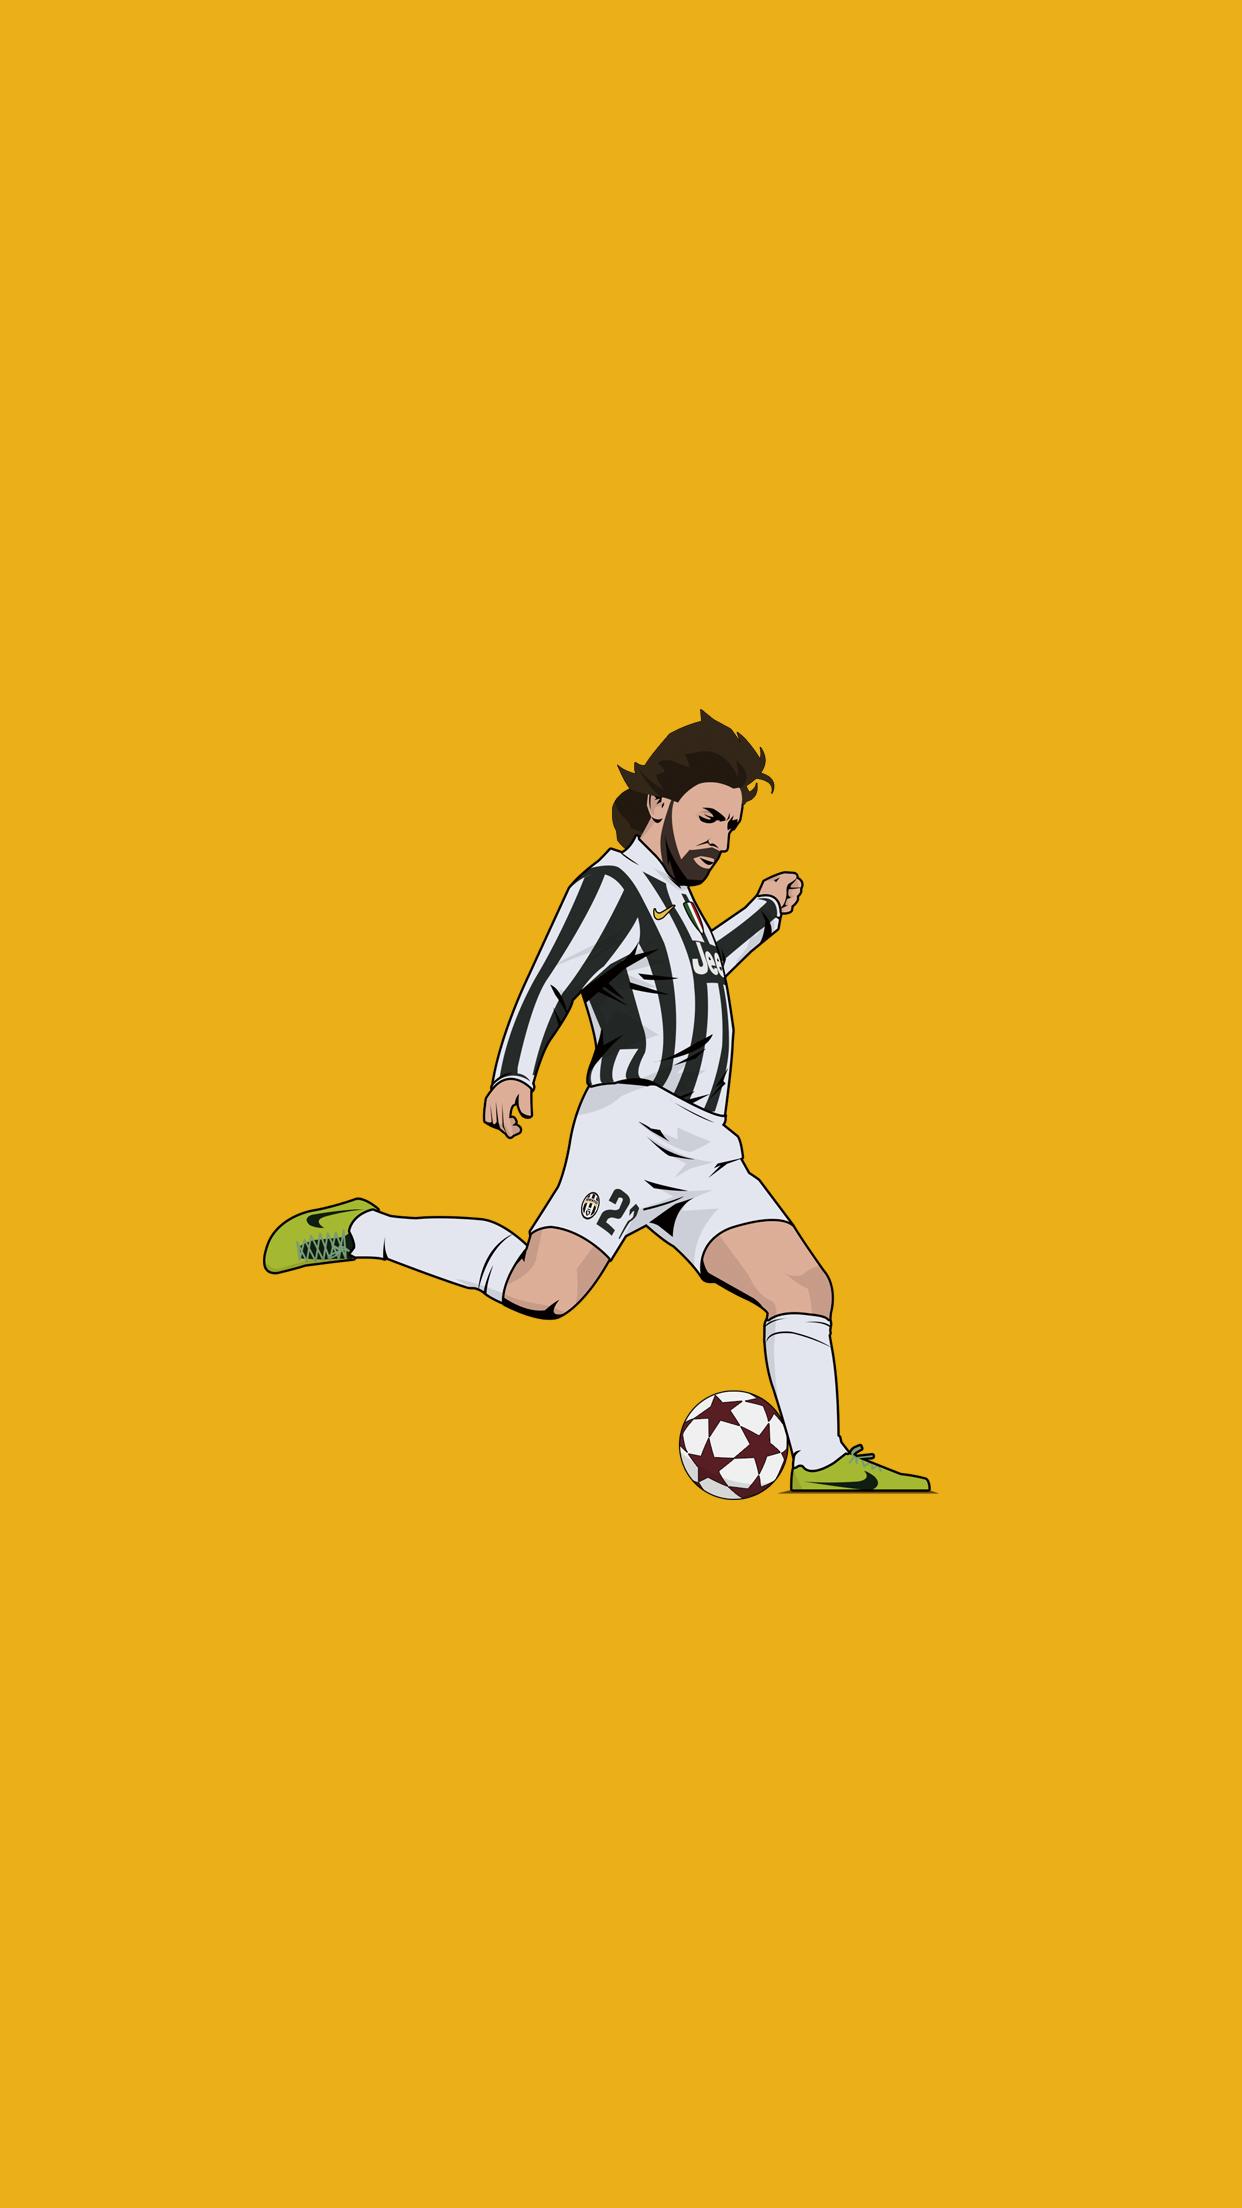 Pin By Mario Lopez On Mata Club Football Culture Football Wallpaper Football Art Football Illustration